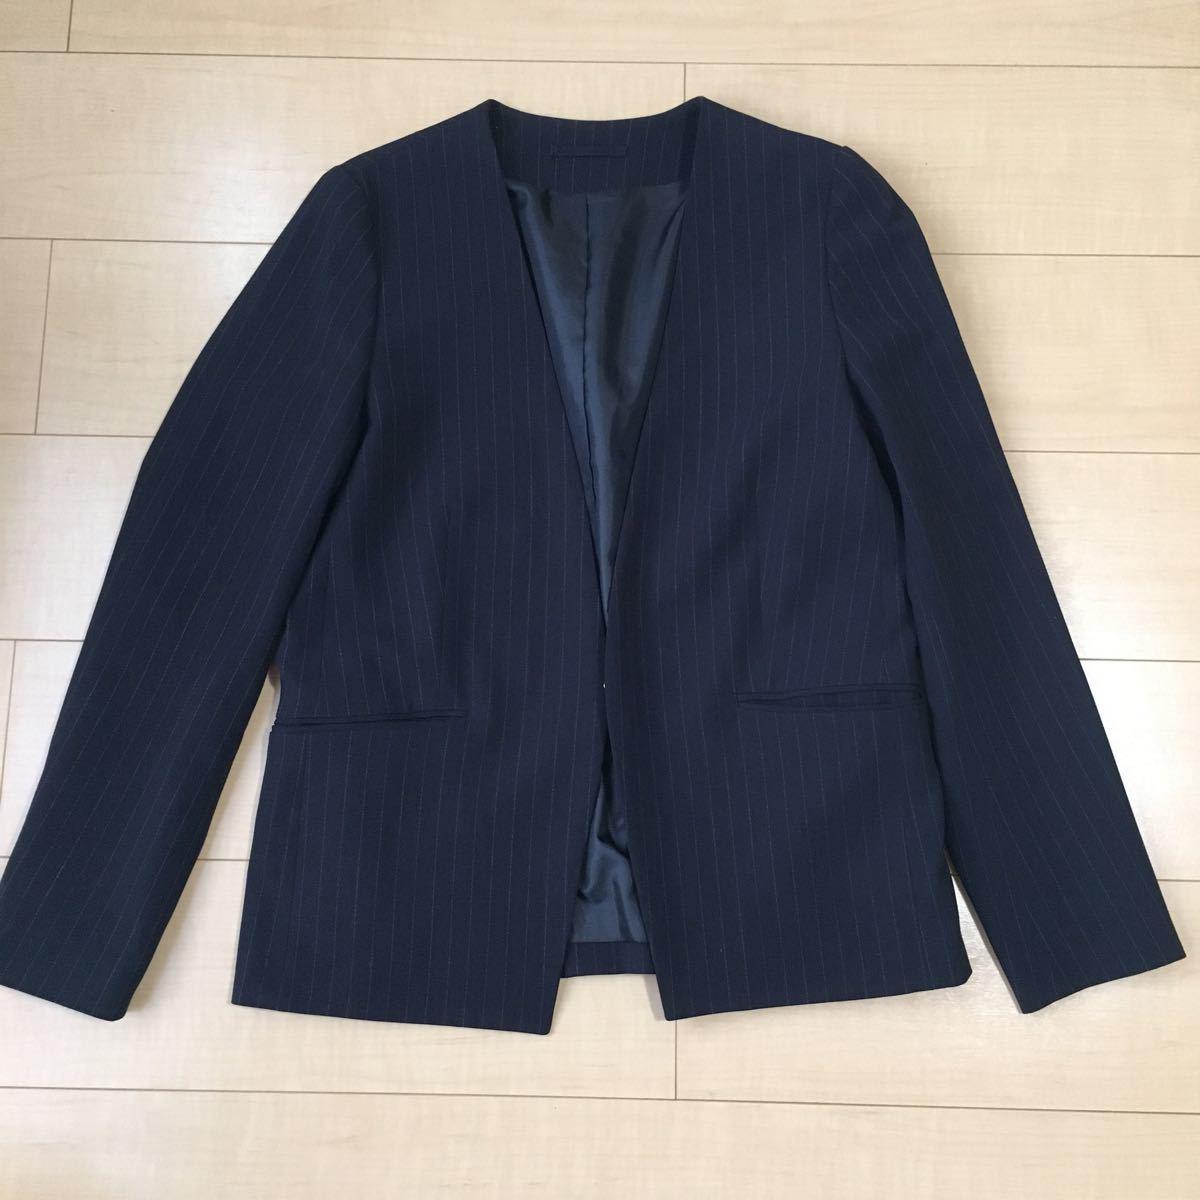 GU  ノーカラージャケット テーラードジャケット スーツ 上着 ジャケット